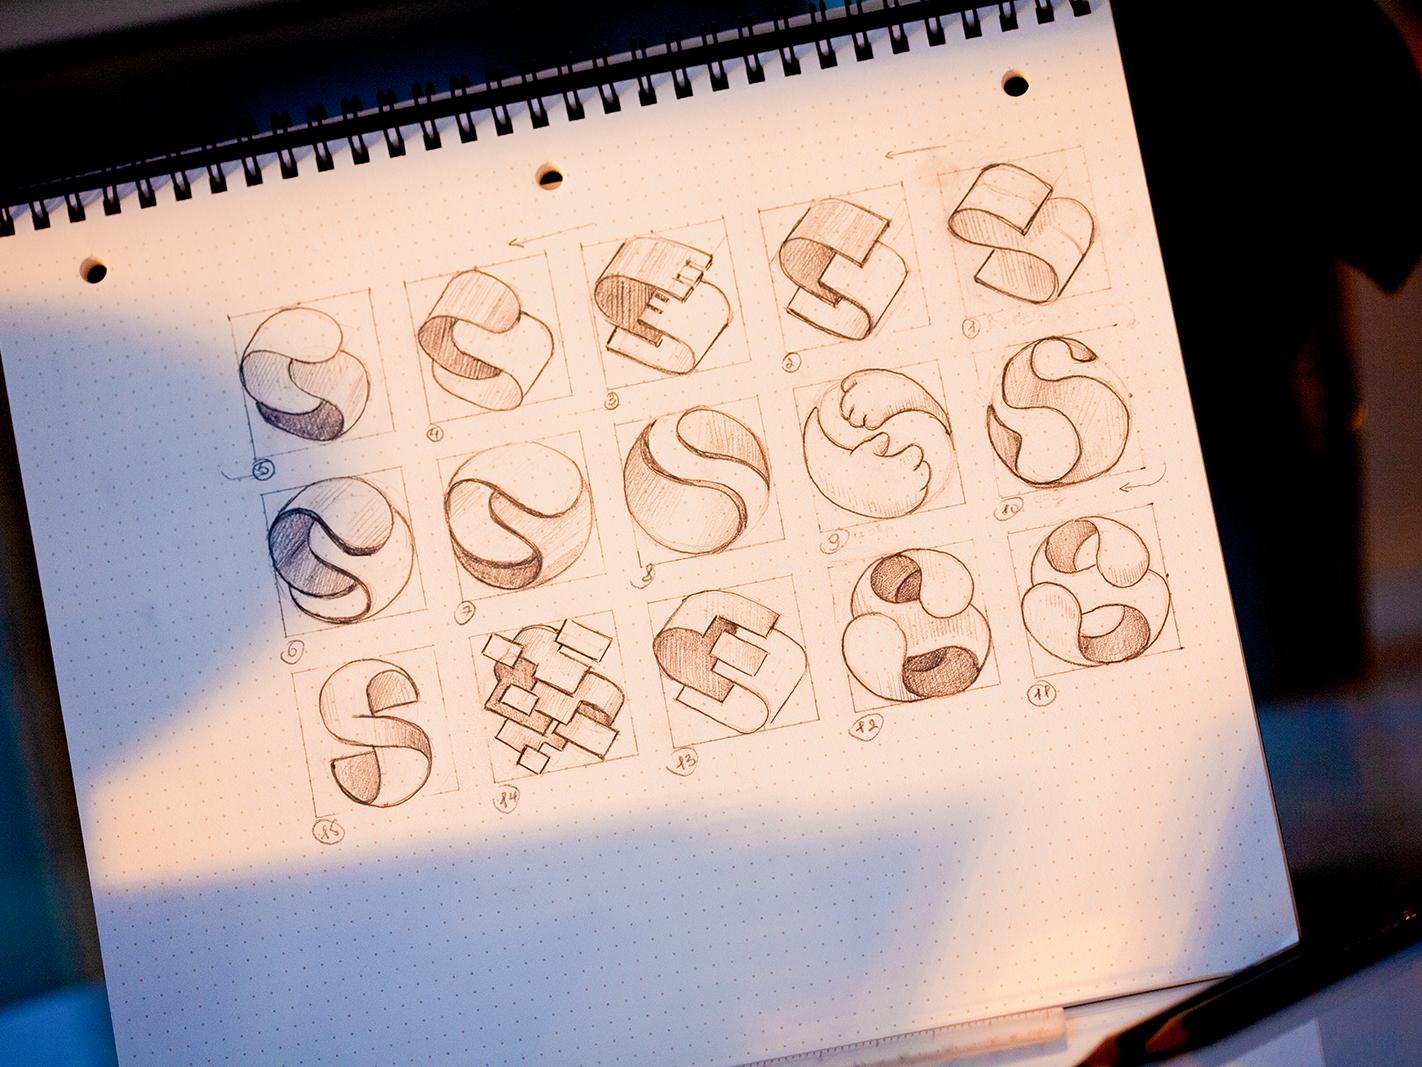 S logo sketches concept pencil paper start s photo sketch drawing illustration logo design